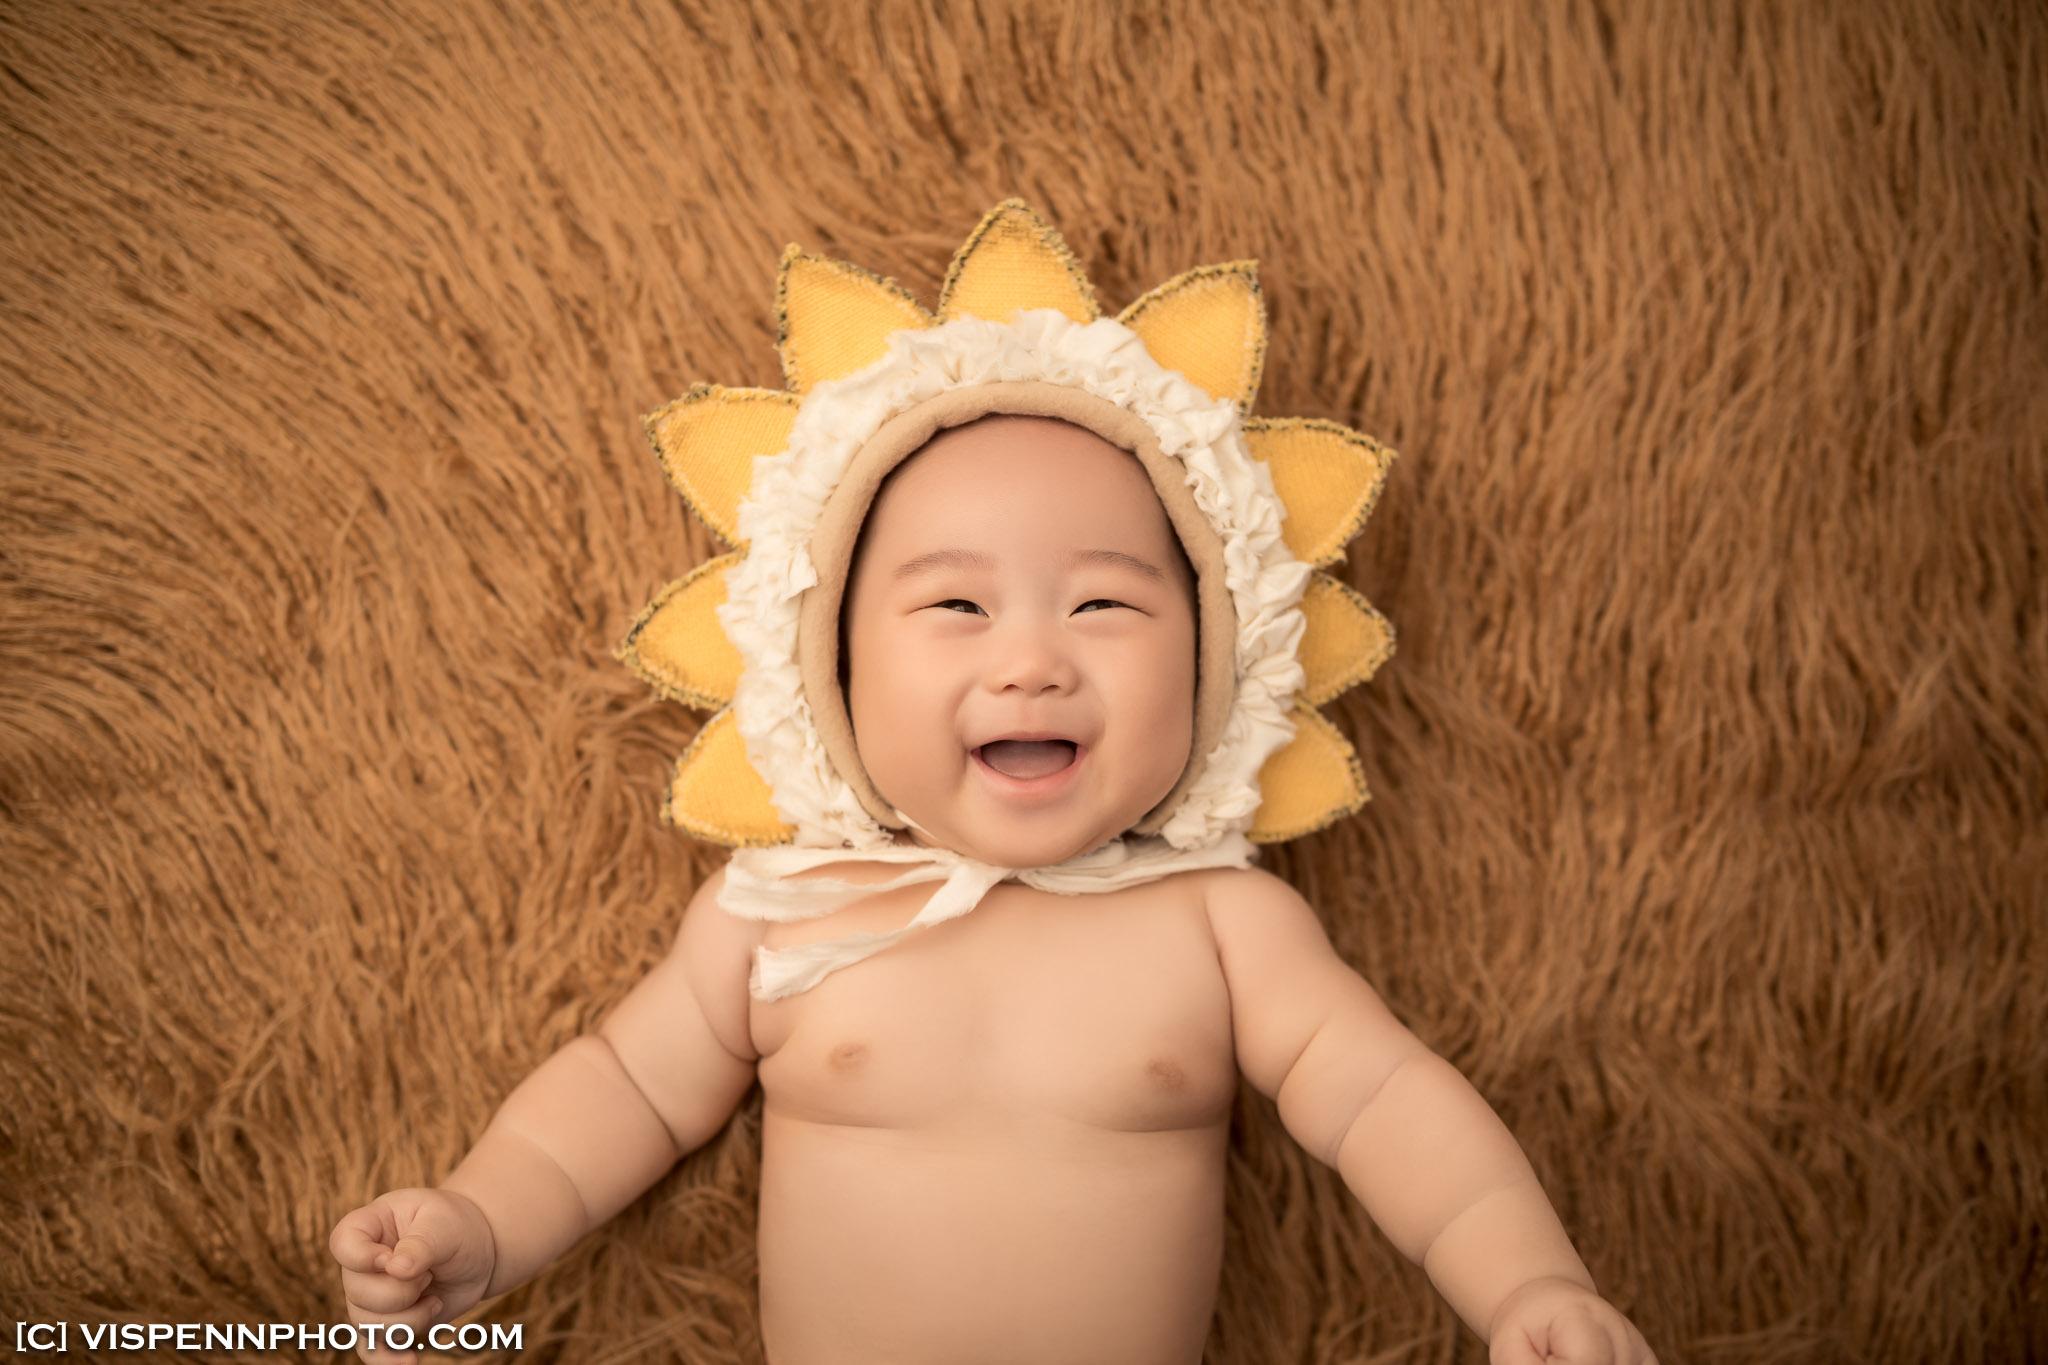 Melbourne Newborn Baby Family Photo BaoBao VISPENN 墨尔本 儿童 宝宝 百天照 满月照 孕妇照 全家福 100DAYS VISPENN CindiYuan 1297